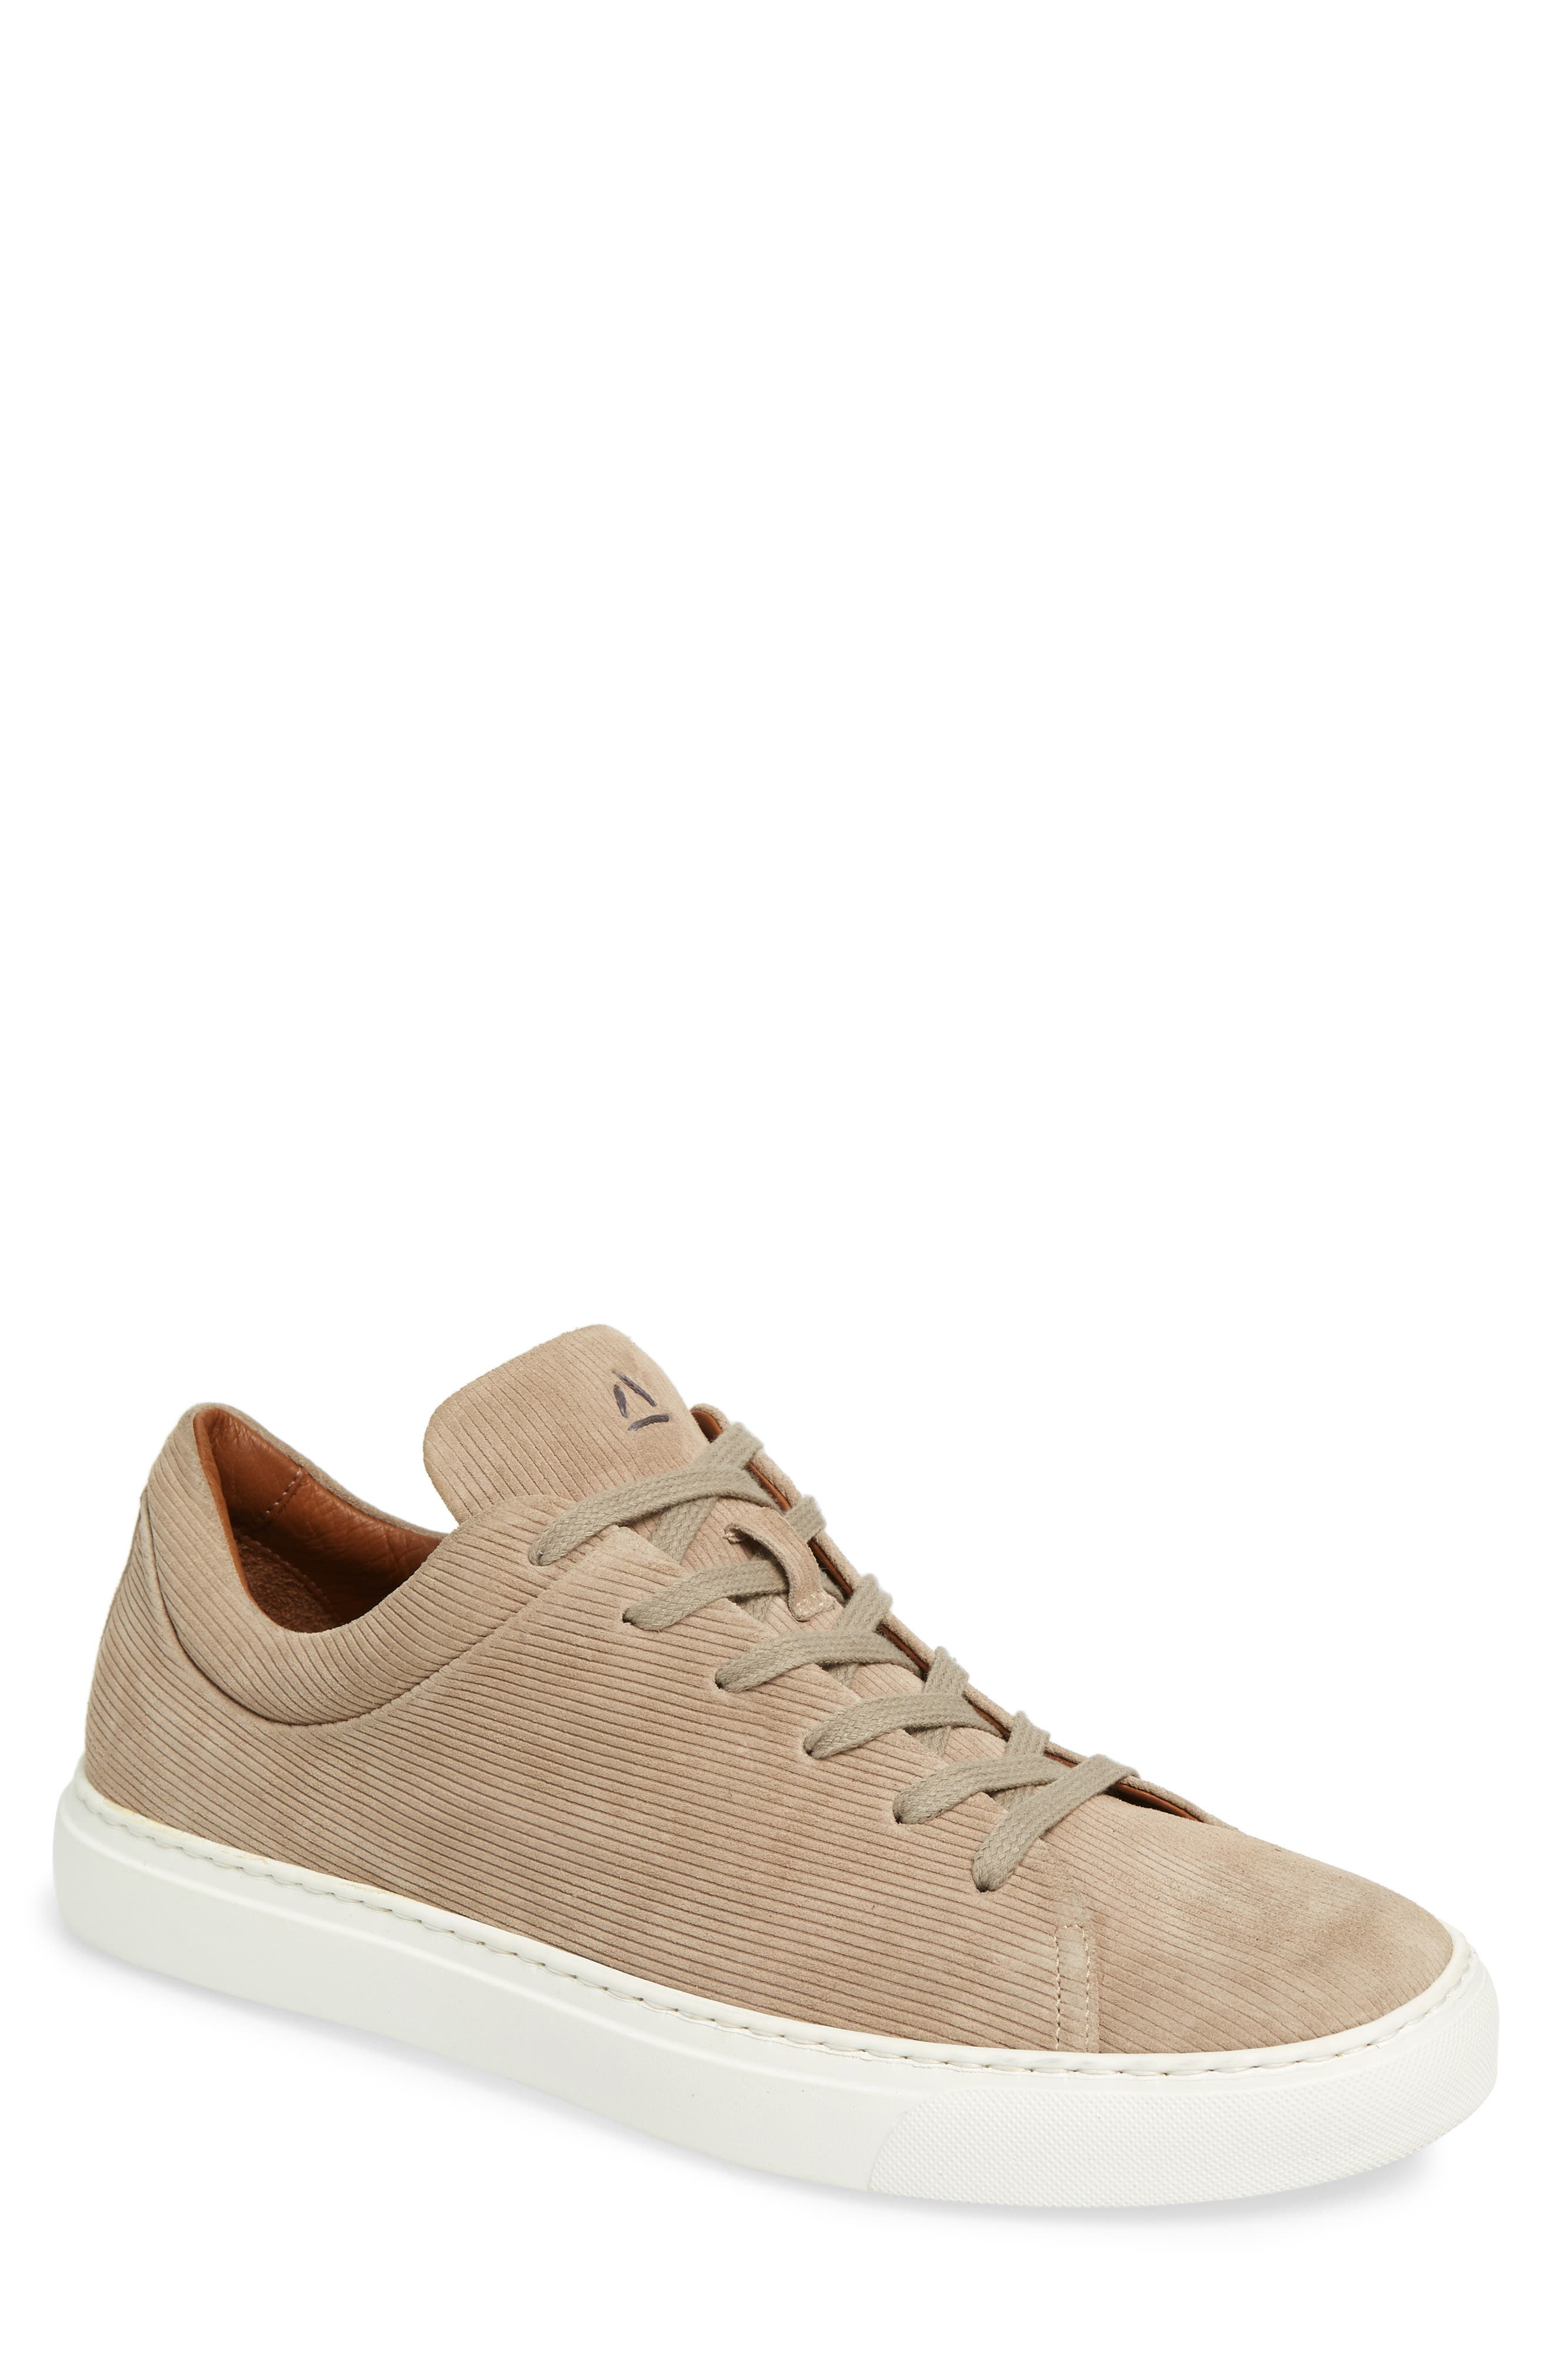 Alaric Sneaker,                         Main,                         color, SAND